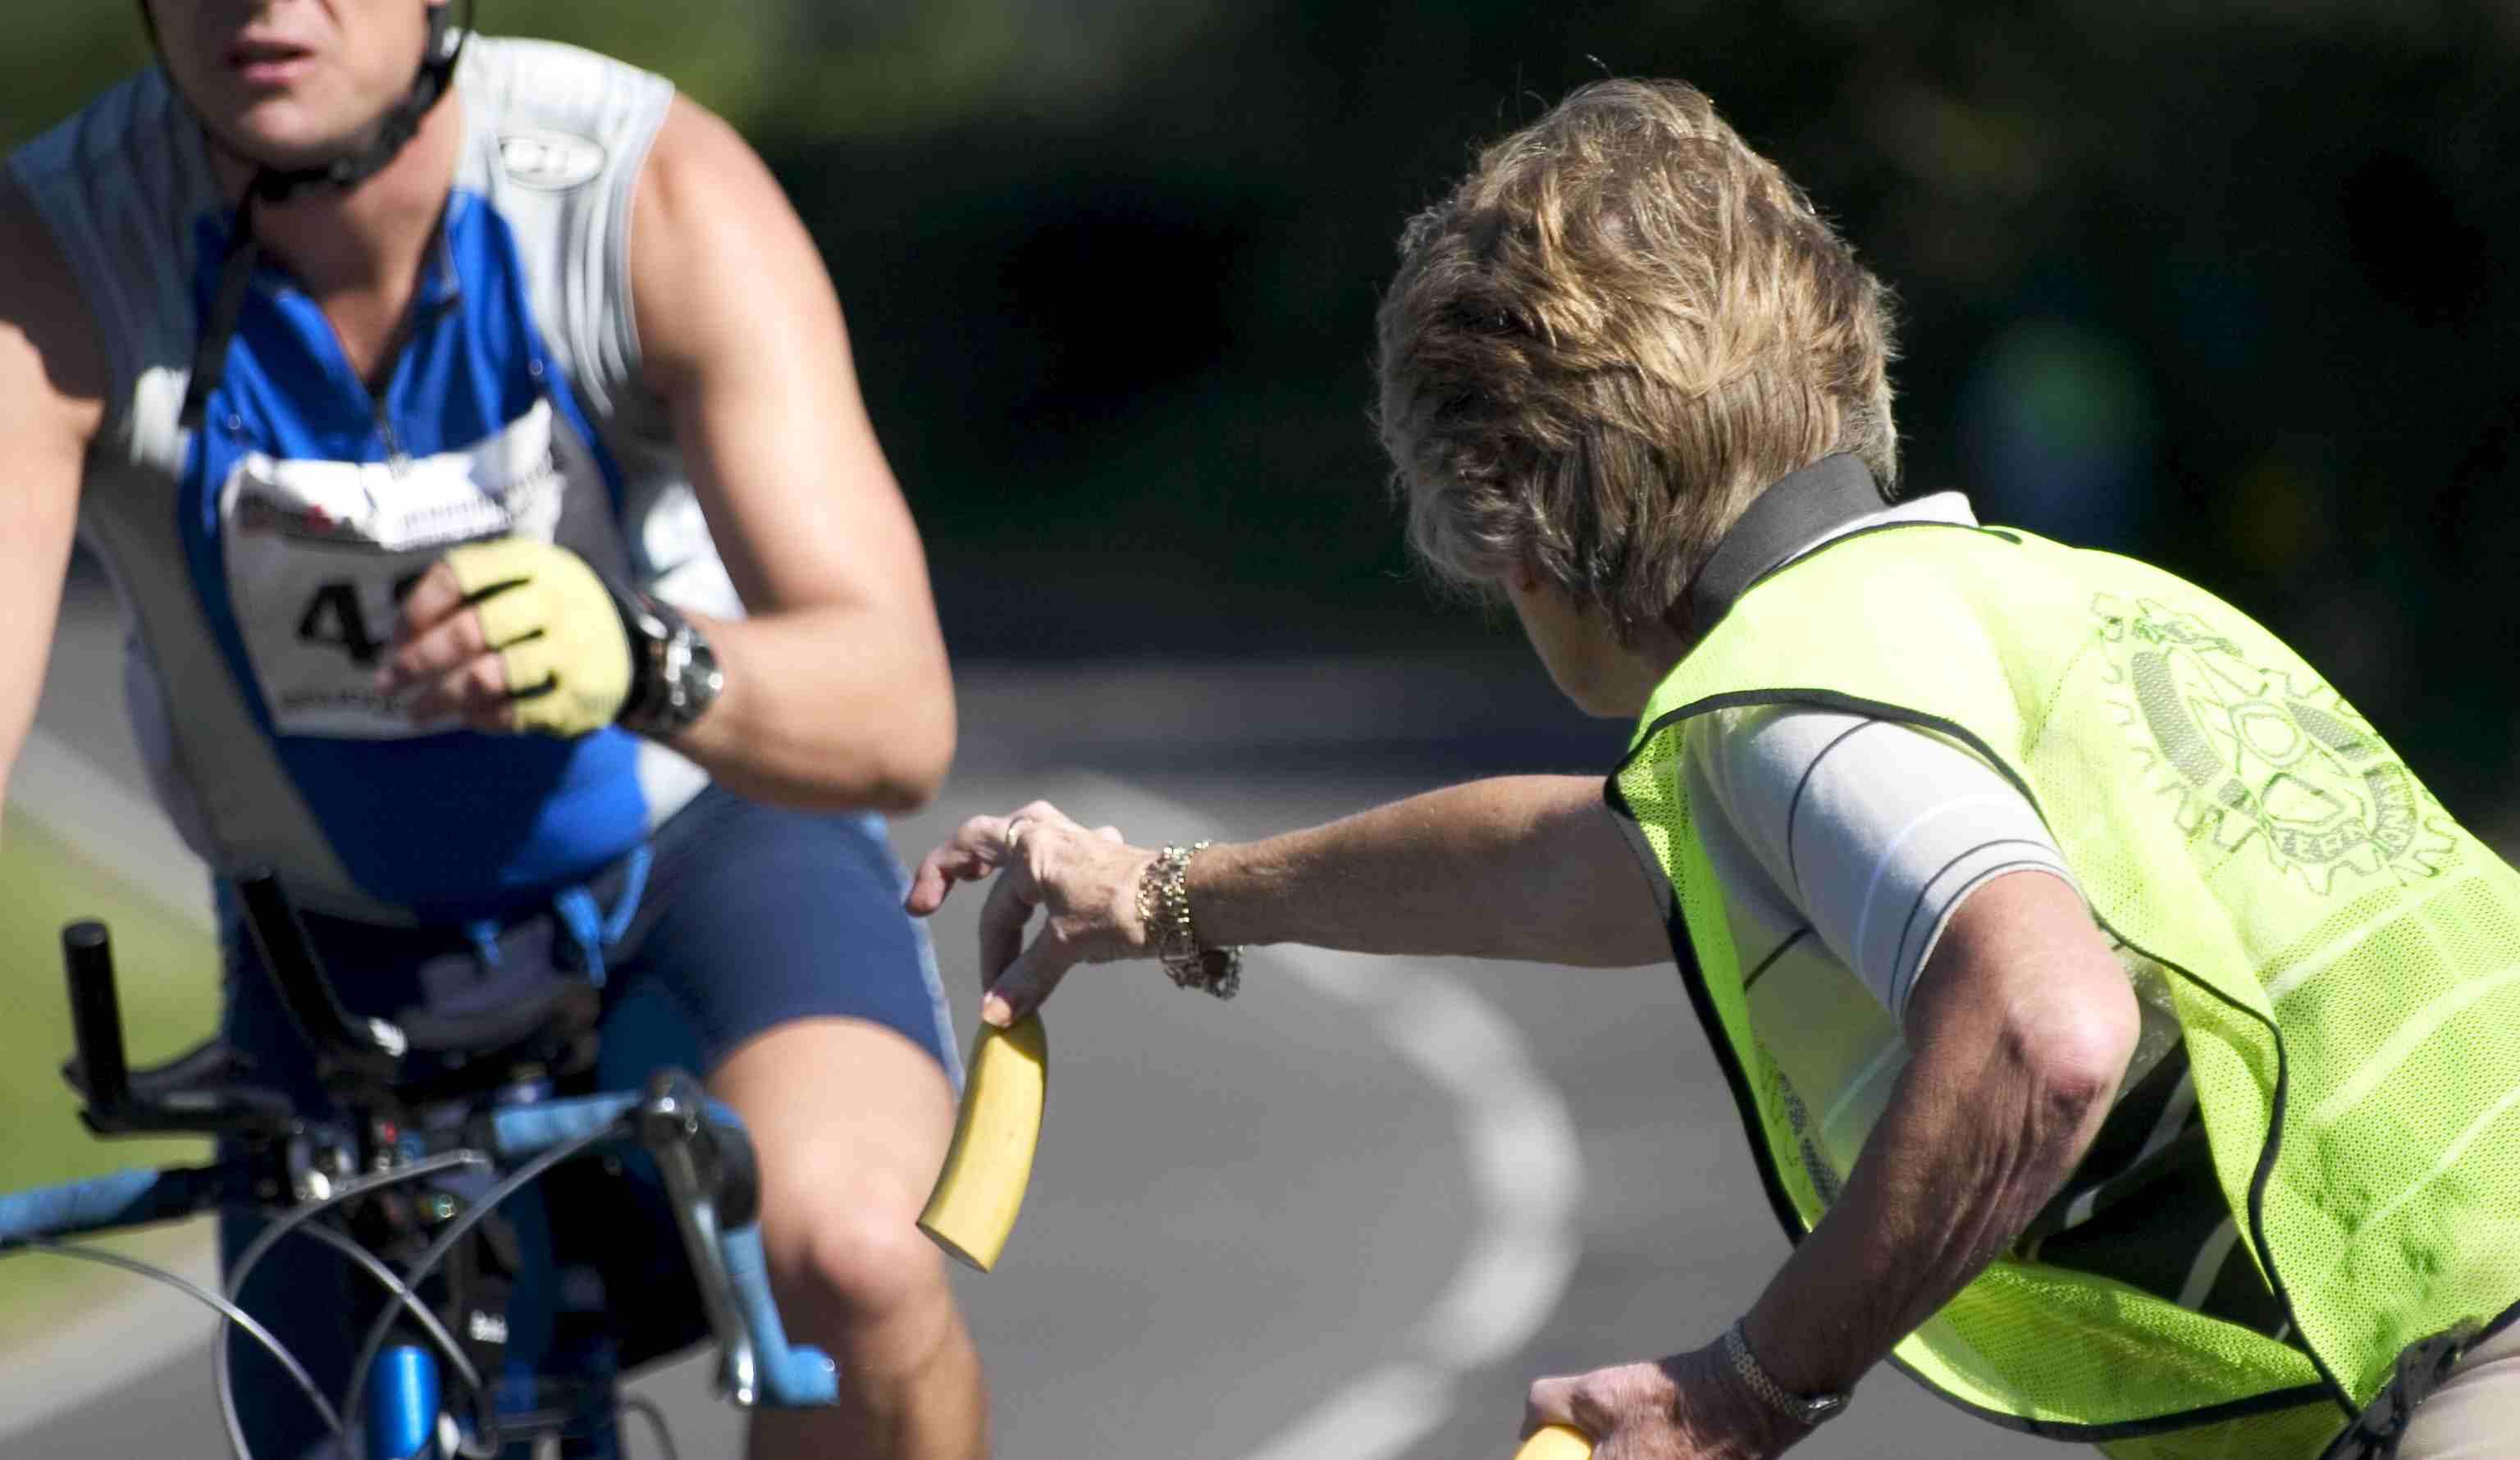 Man handing banana to biker during race